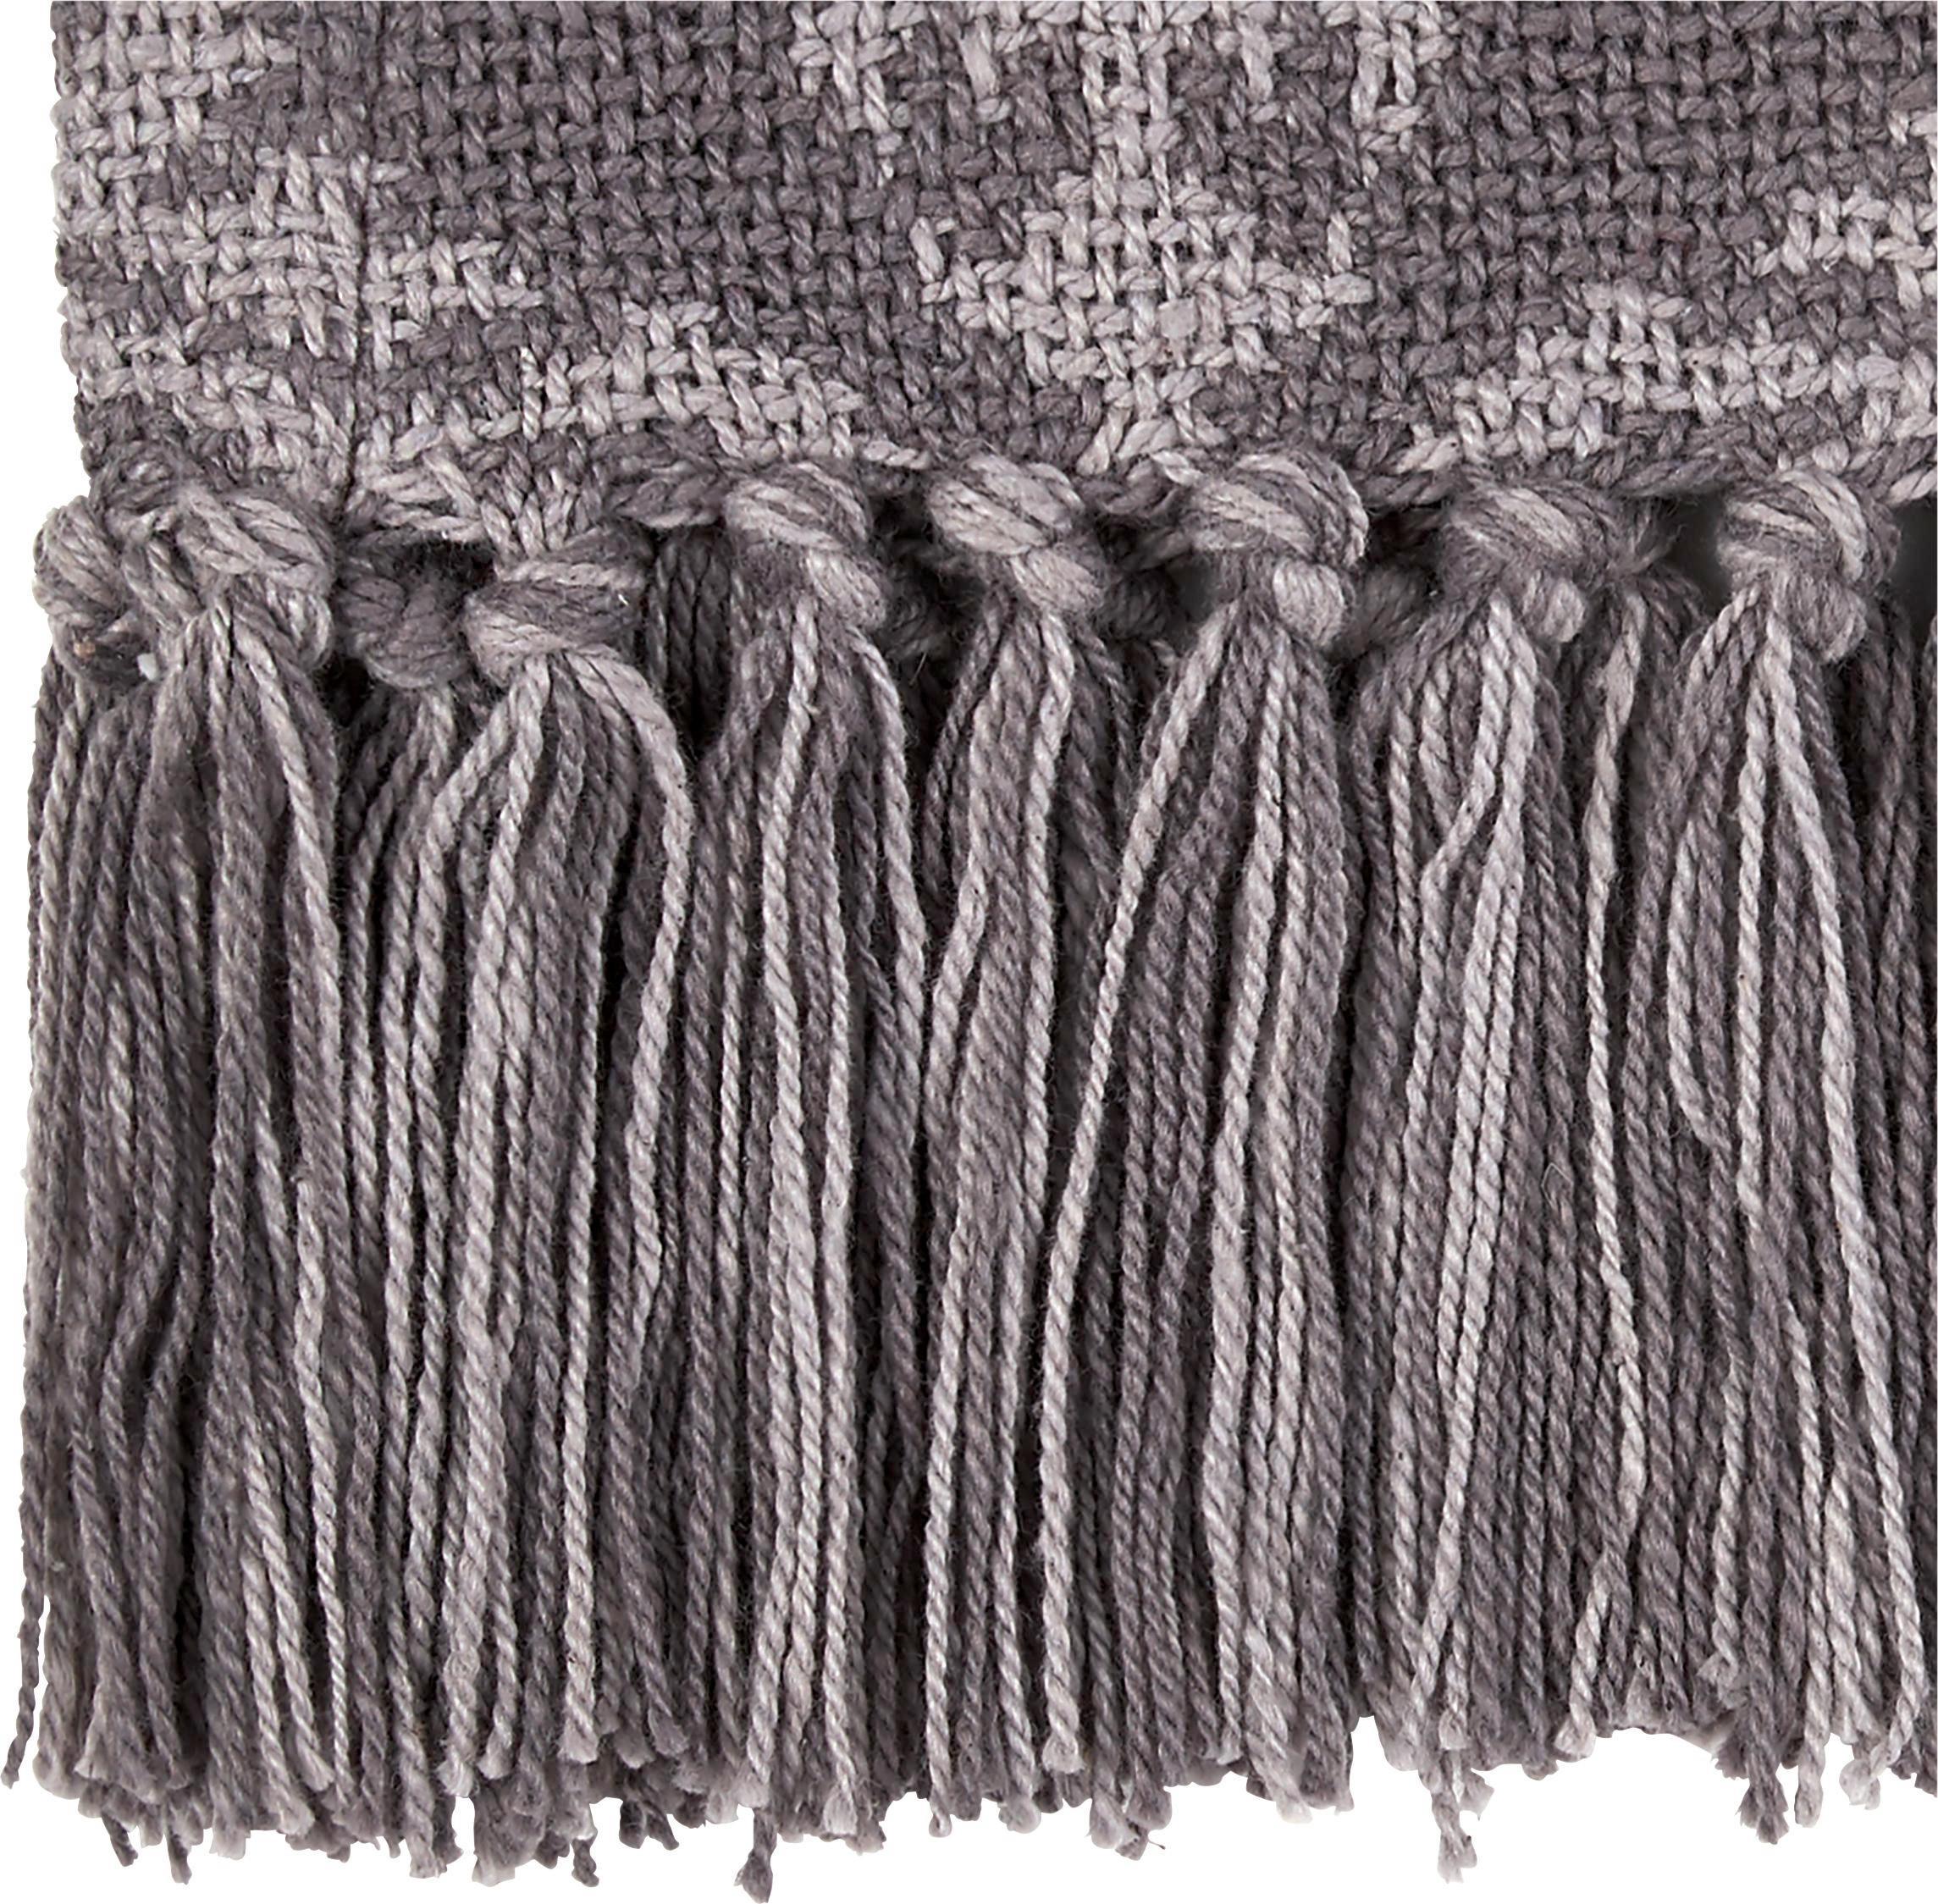 Baumwolldecke Ornament 130x170cm - Dunkelgrau/Hellgrau, MODERN, Textil (130/170cm) - MÖMAX modern living